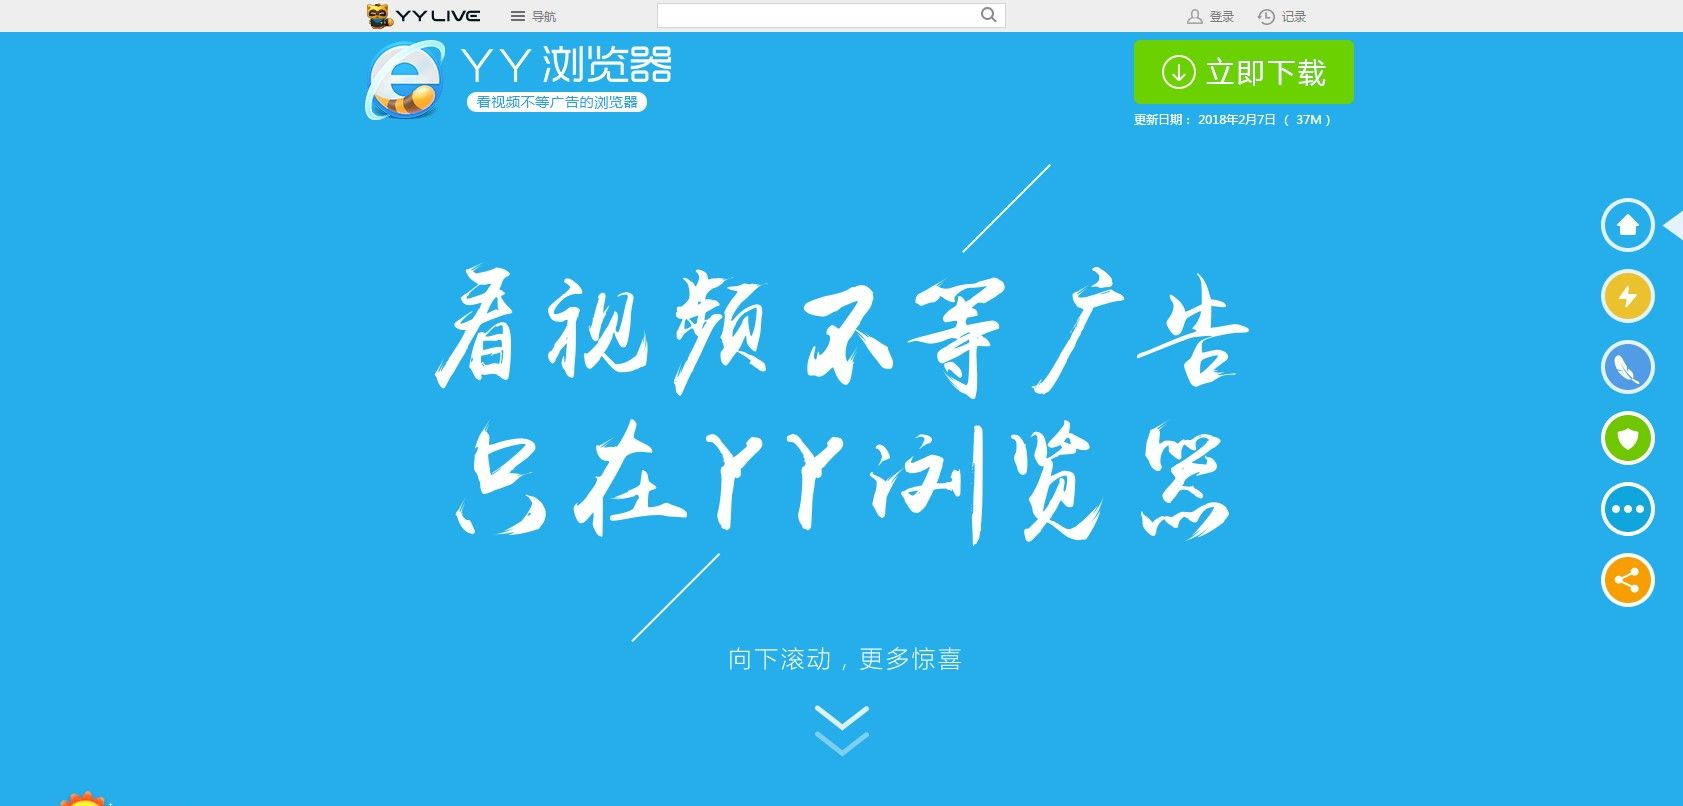 yy浏览器官网下载V3.5.4417.0版(歪歪浏览器)图片1